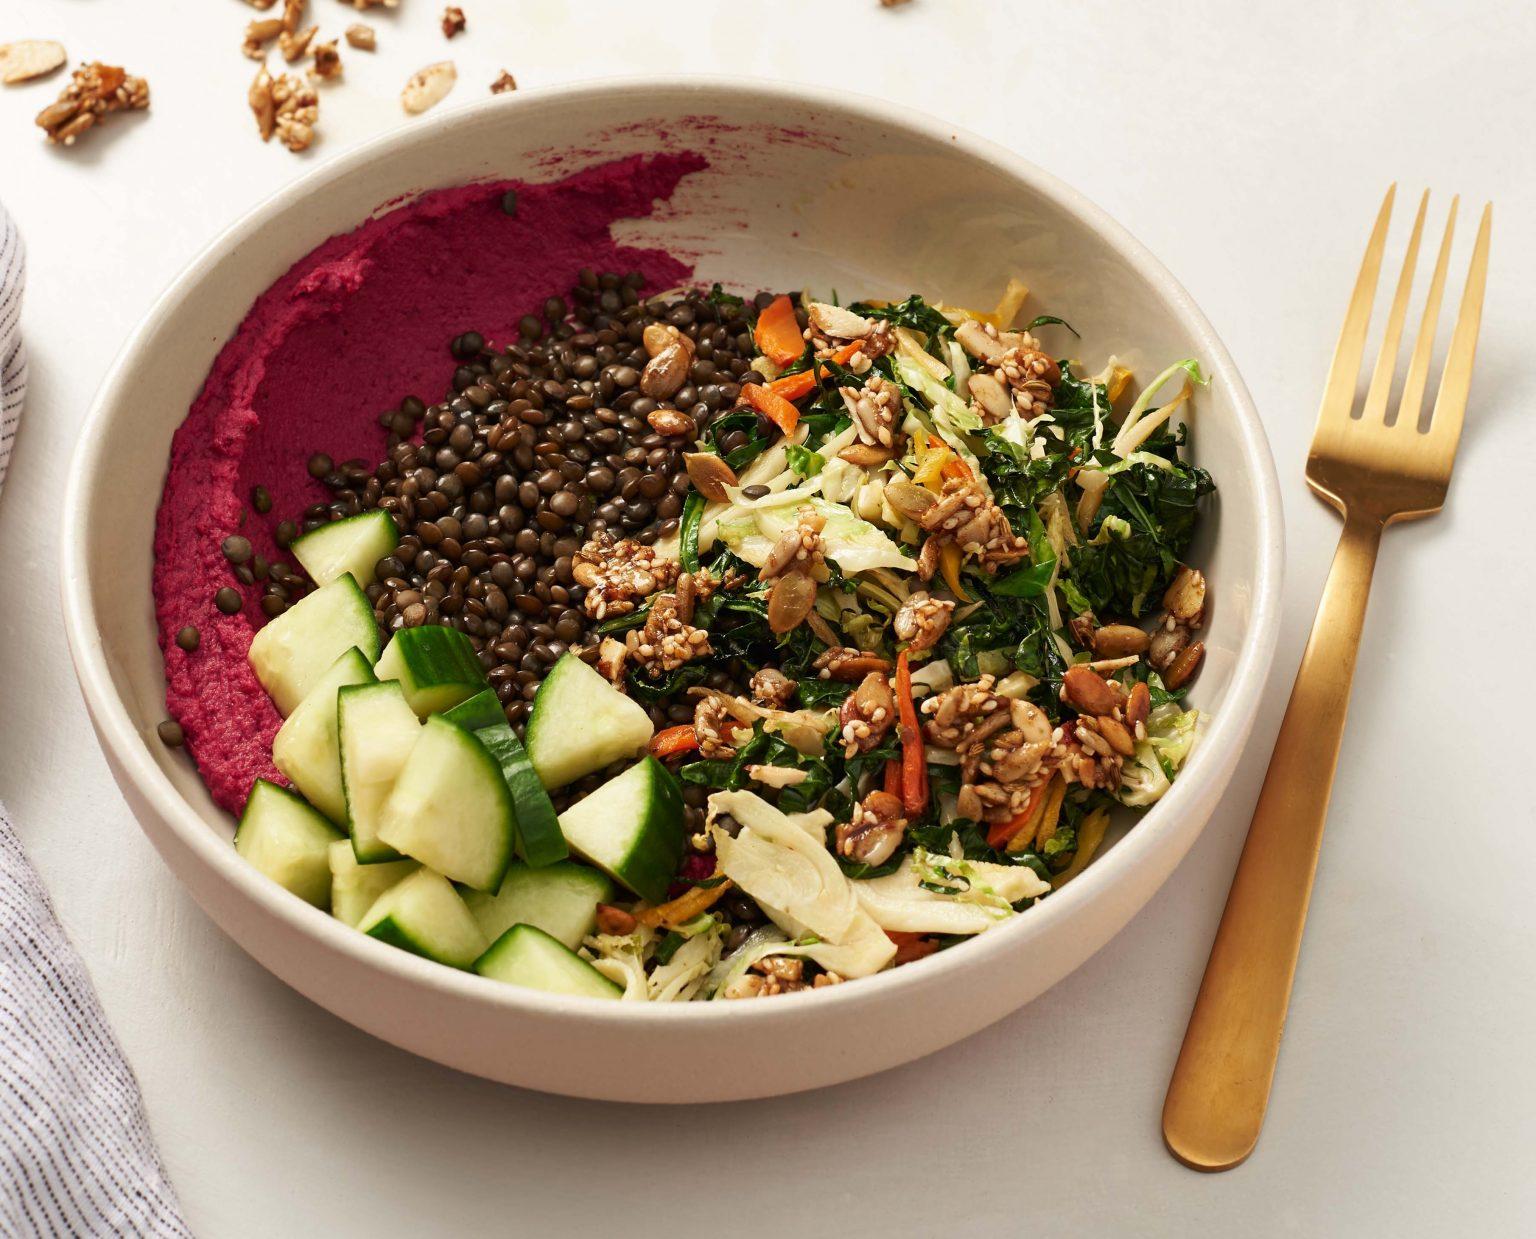 Vegan Roasted Beet Hummus Bowls